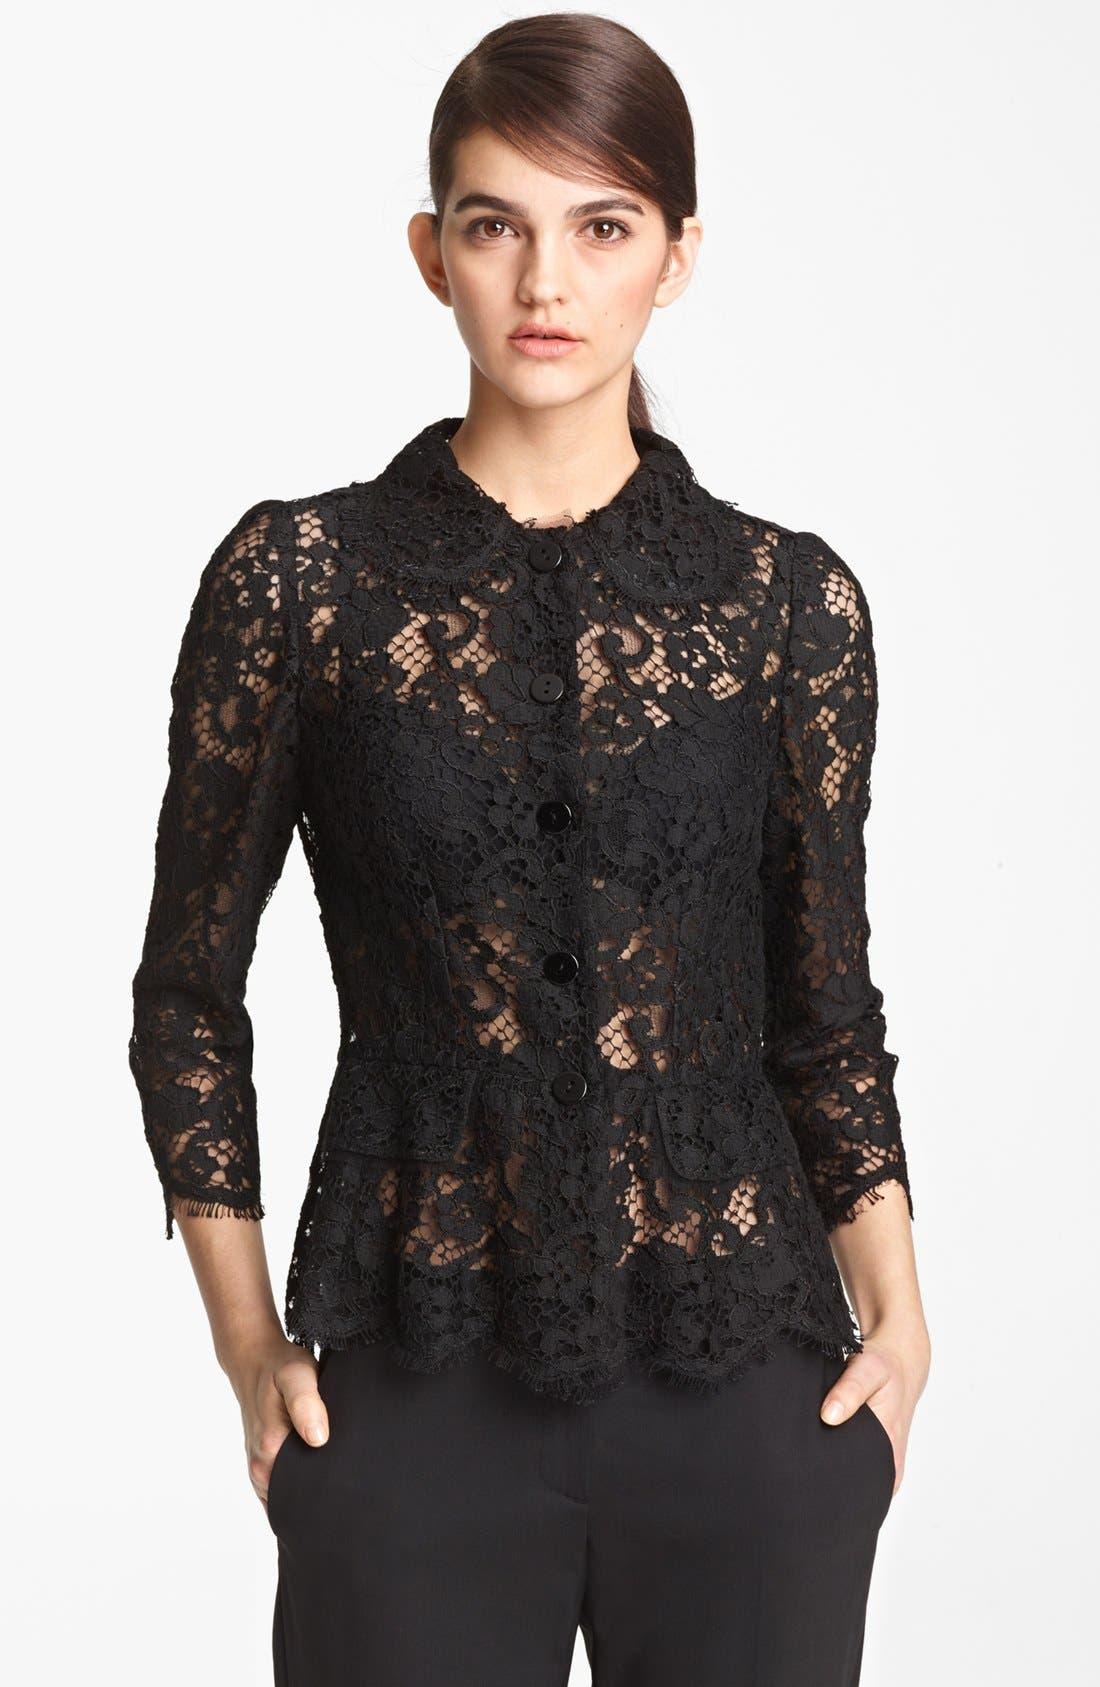 Alternate Image 1 Selected - Dolce&Gabbana Sheer Lace Jacket